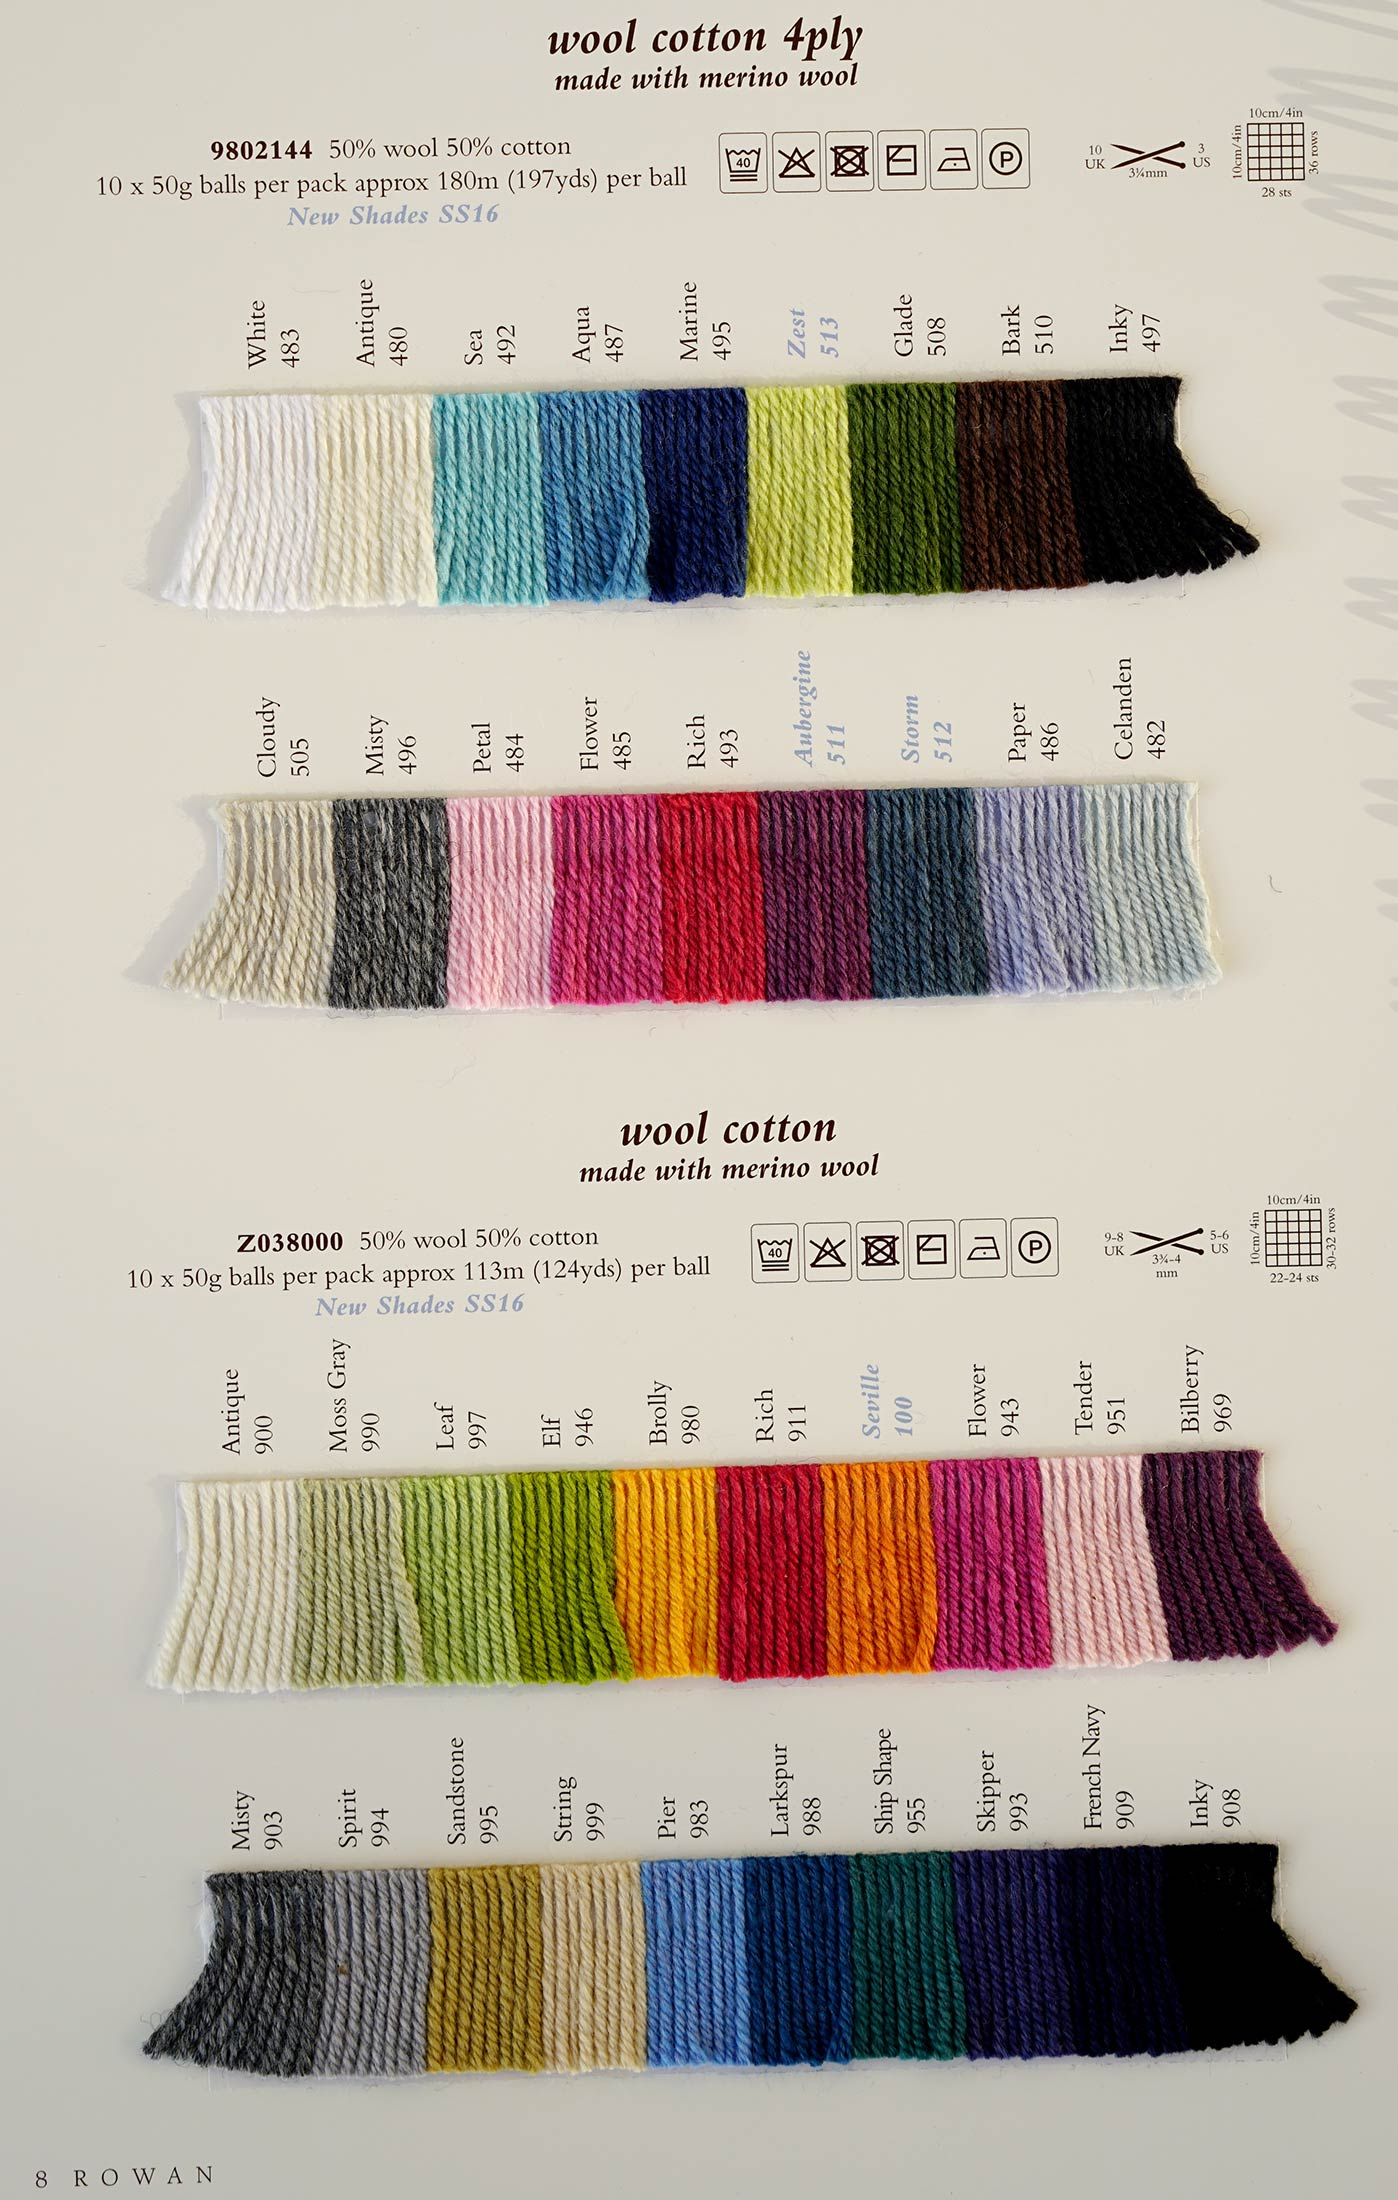 Rowan Wool Cotton Dk Rowan Yarns Ryc Sirdar Sublime